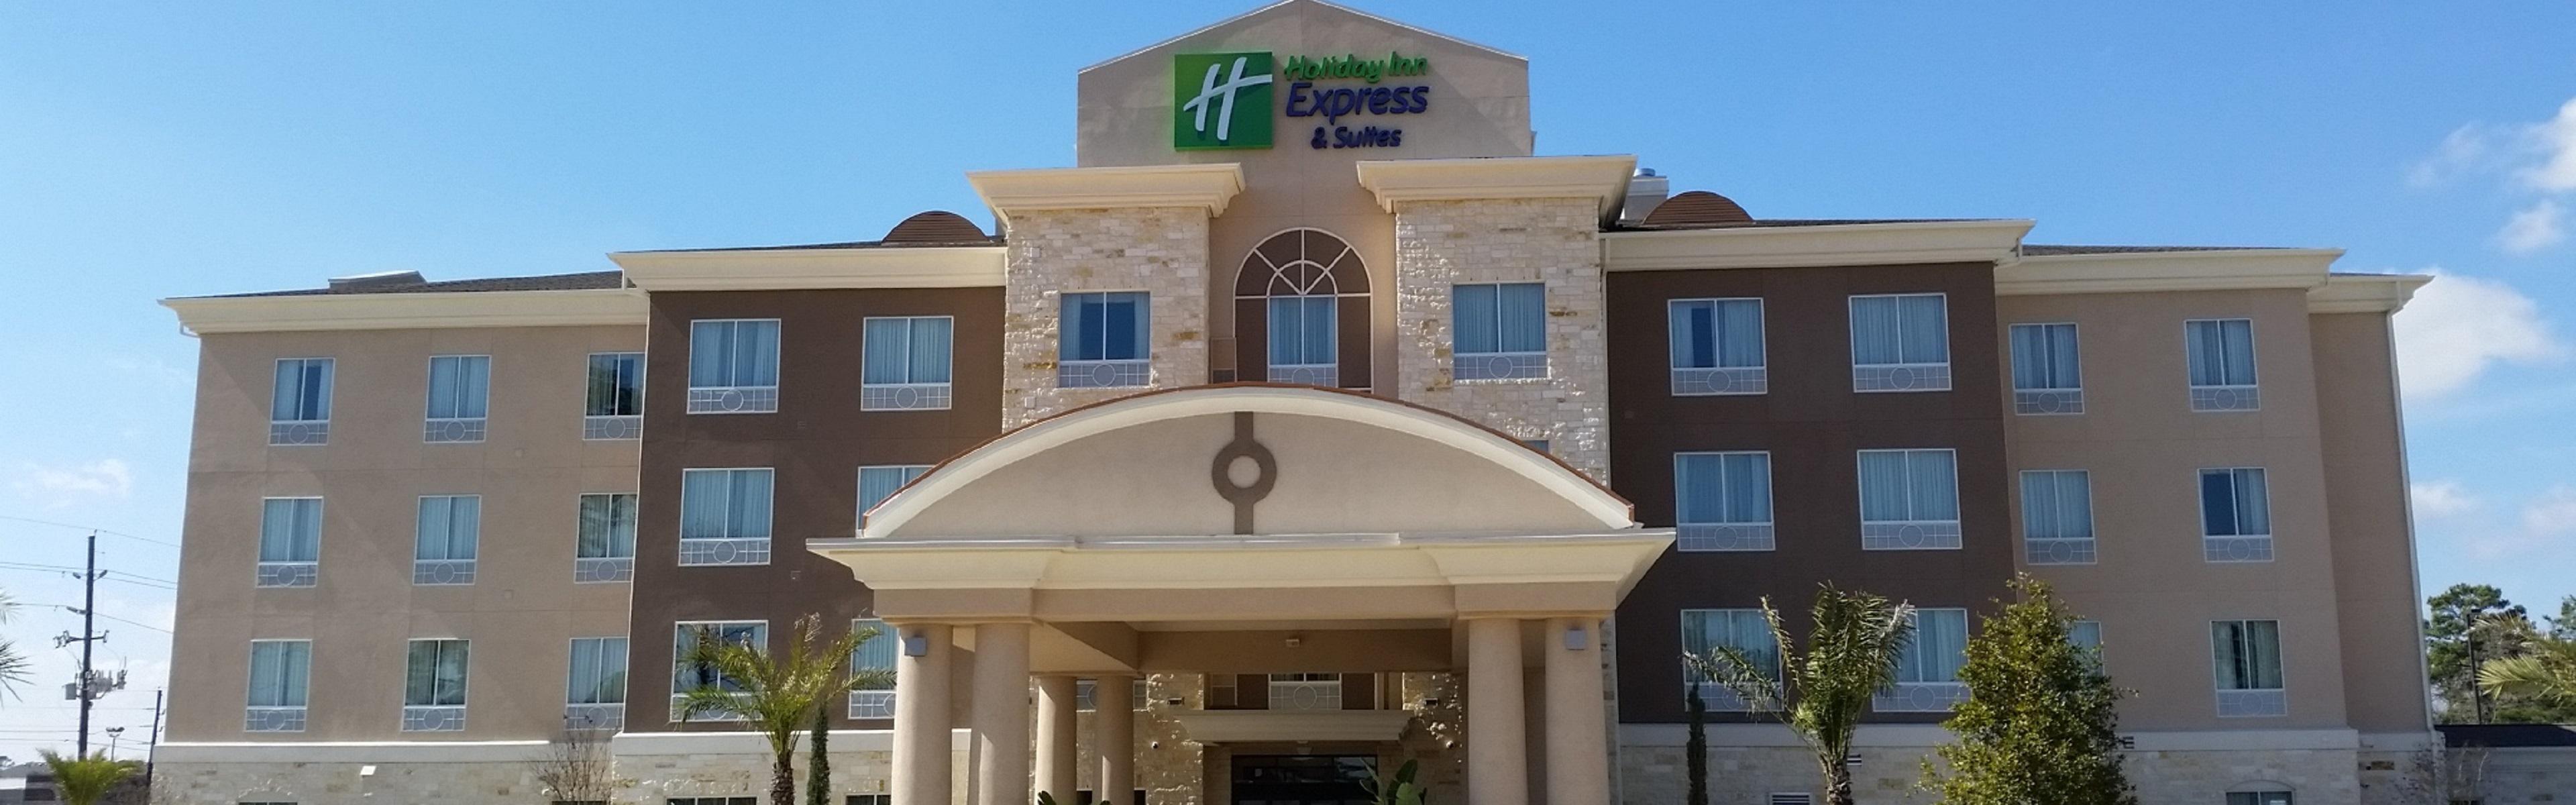 Holiday Inn Express & Suites Atascocita - Humble - Kingwood image 0